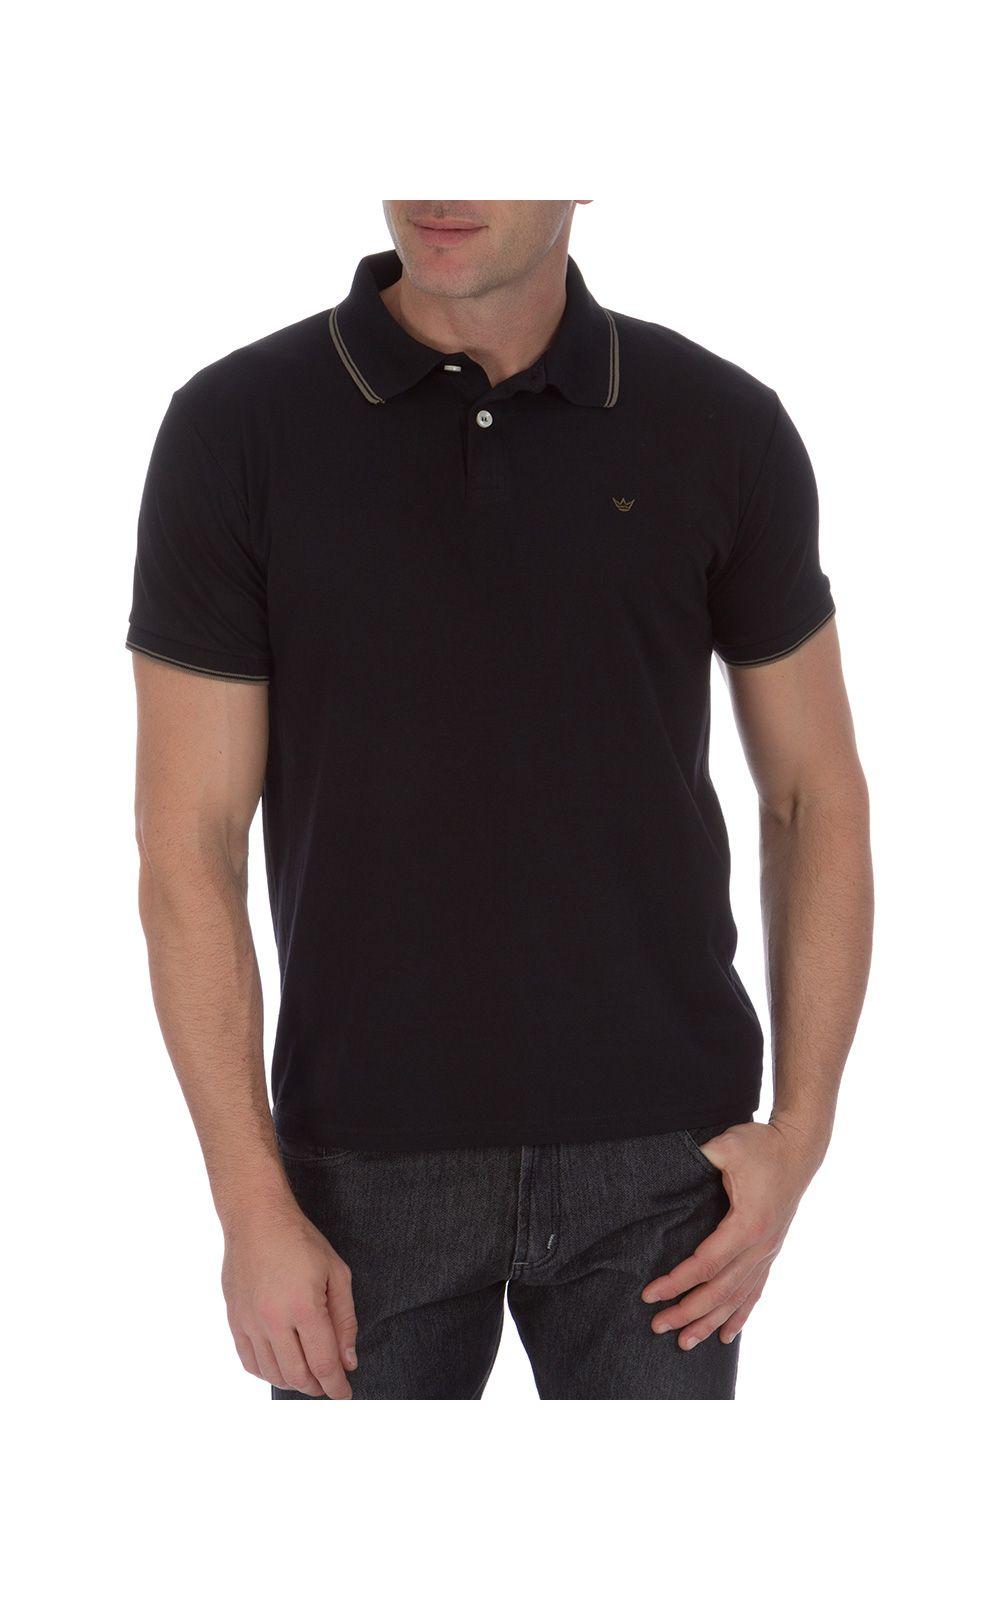 Foto 1 - Camisa Polo Masculina Preta Detalhada